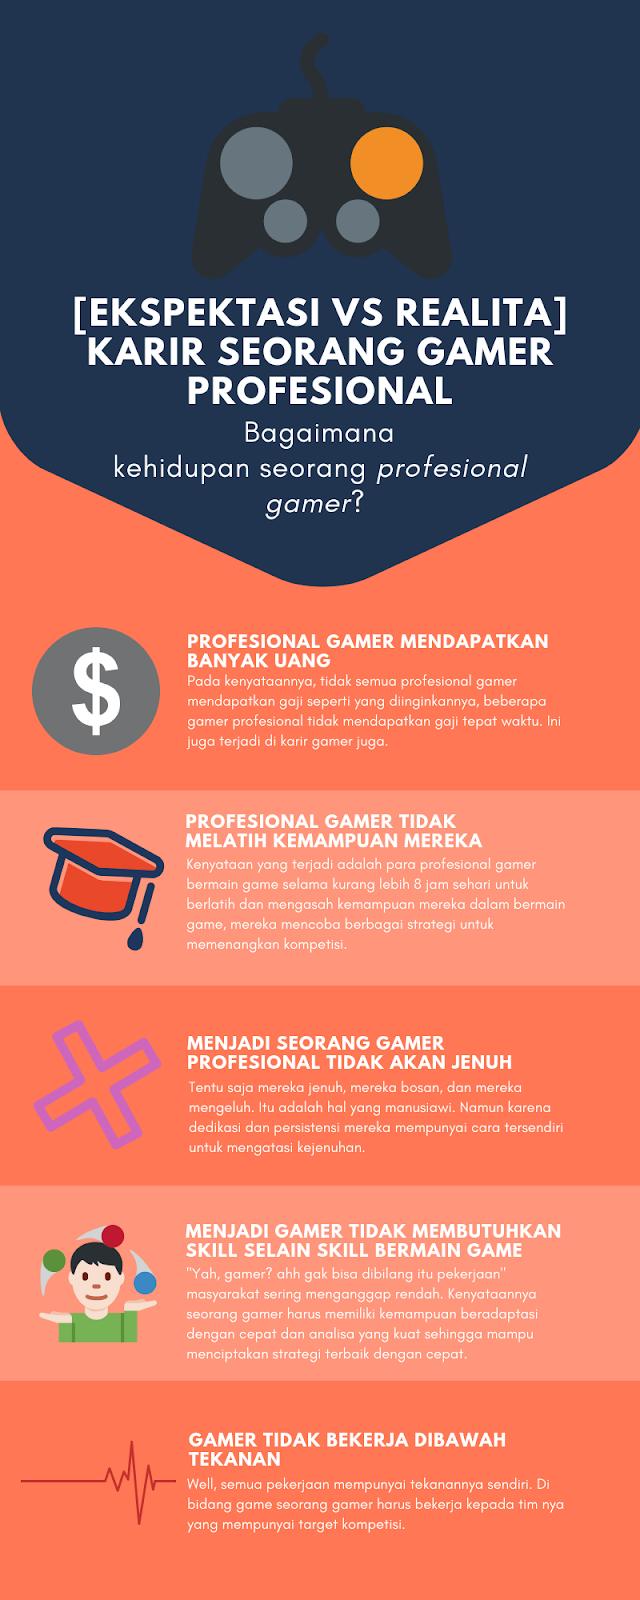 Realita VS Ekspektasi Seorang Gamer